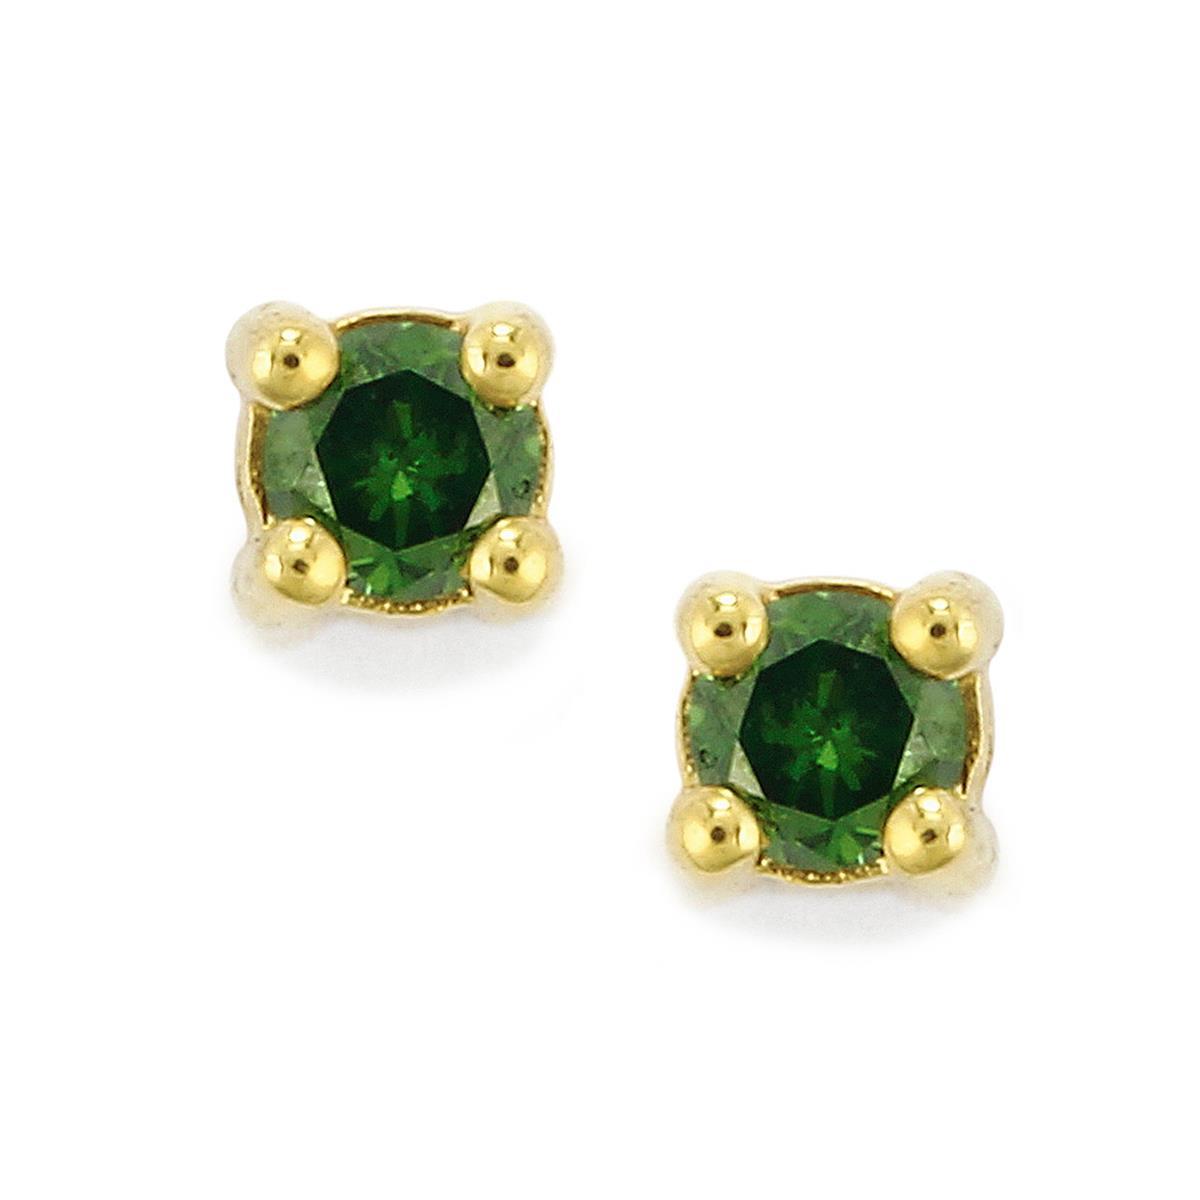 0.13 Ct. Turtle Tortoise Stud Earrings